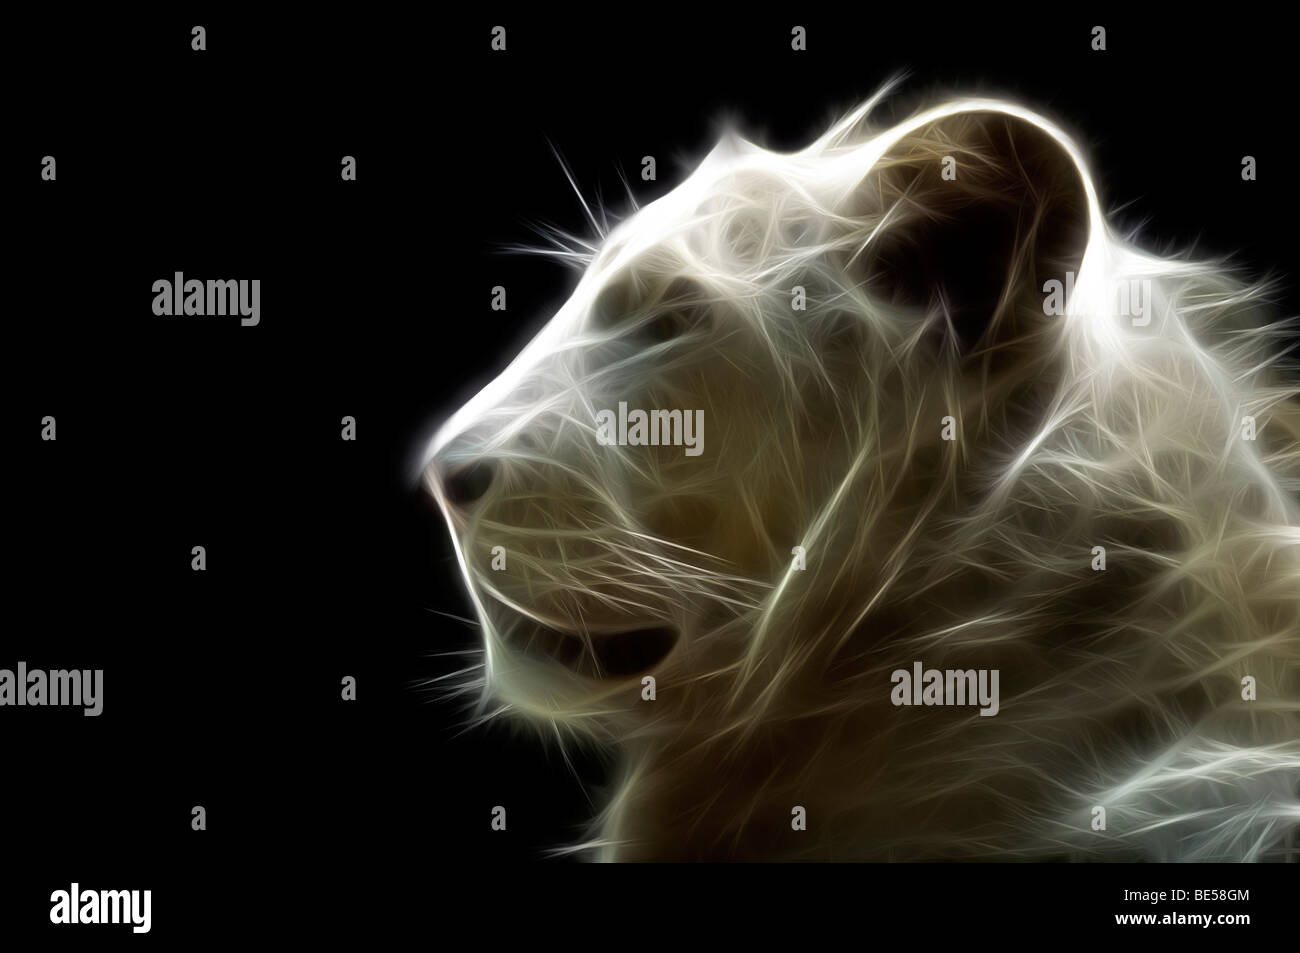 Un ilustrado digitalmente la cabeza de un león blanco (Panthera leo). Portrait d'un león blanc ( Dessin assisté Foto de stock